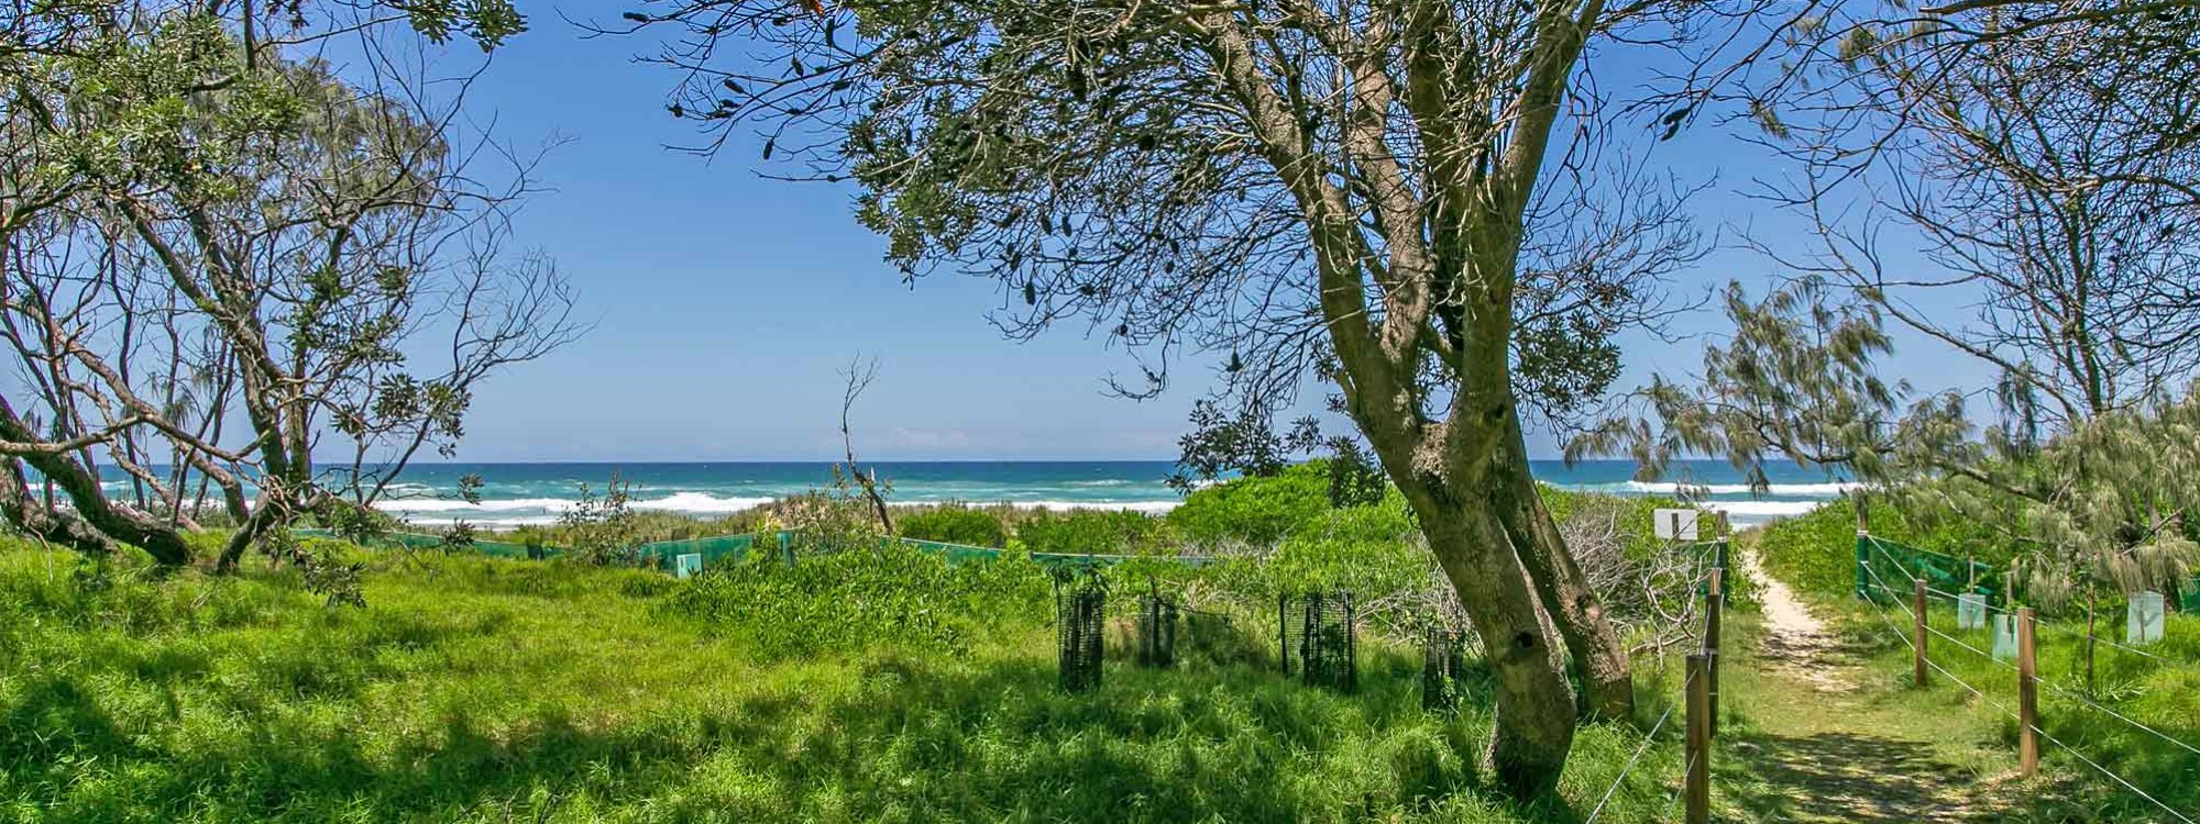 Beachwood - Byron Bay - Beach track to the beach 2